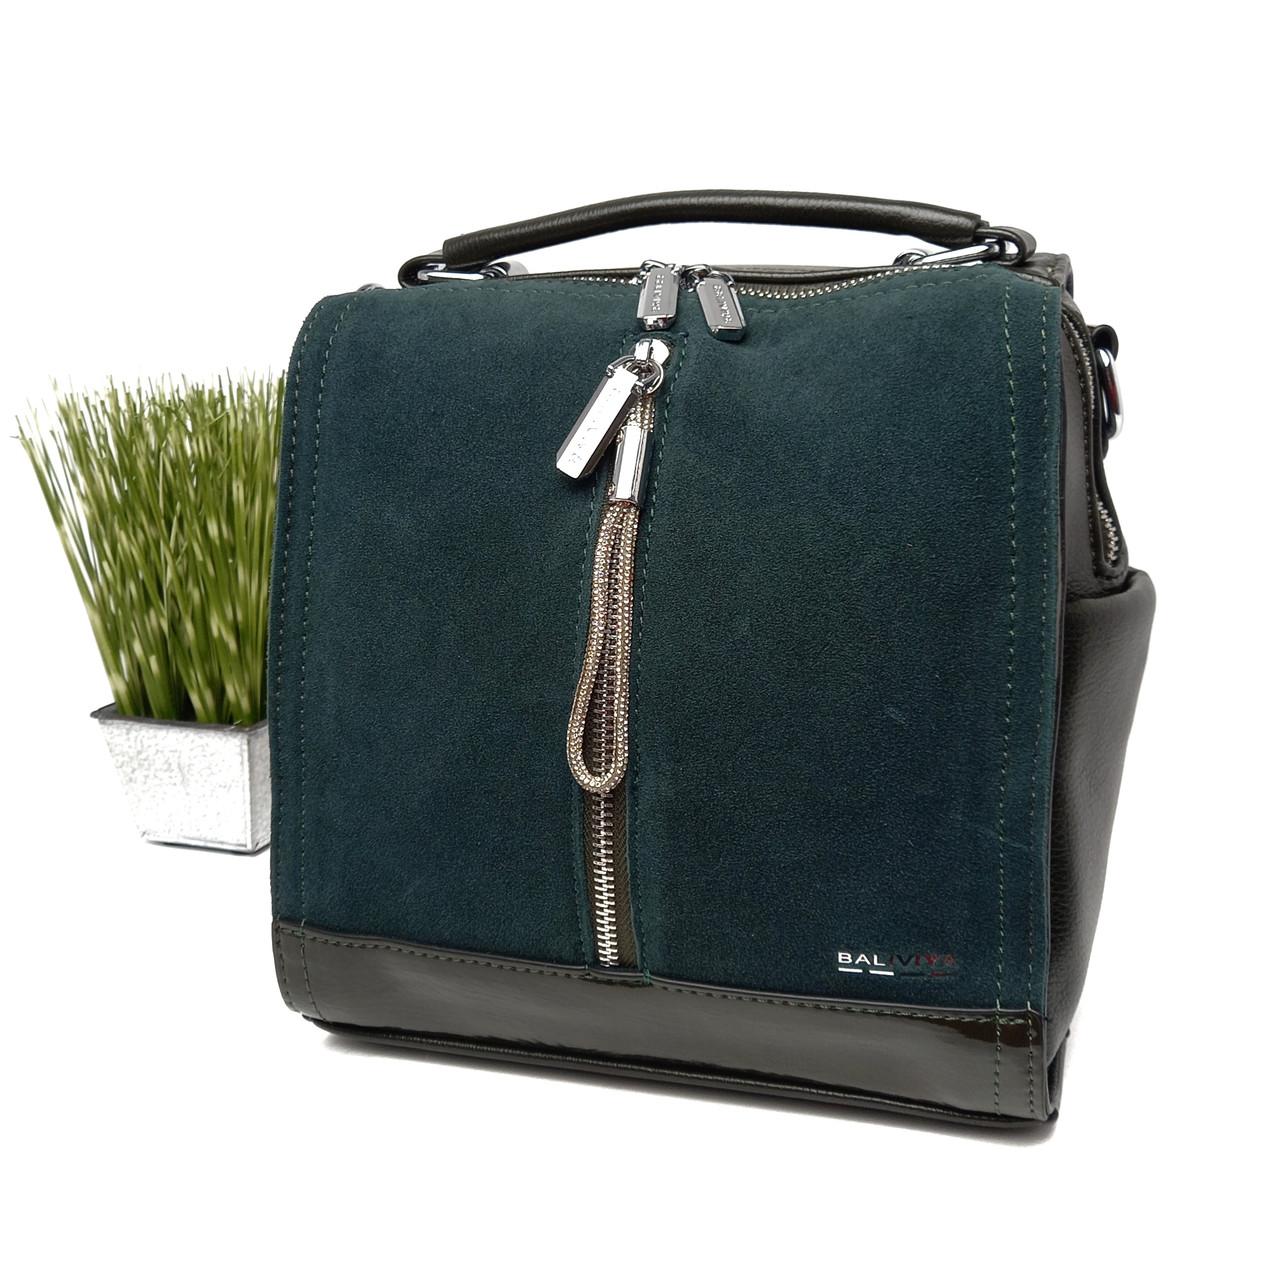 Сумка рюкзак жіноча натуральна замша зелений Арт.21027-1P Baliviya (Китай)